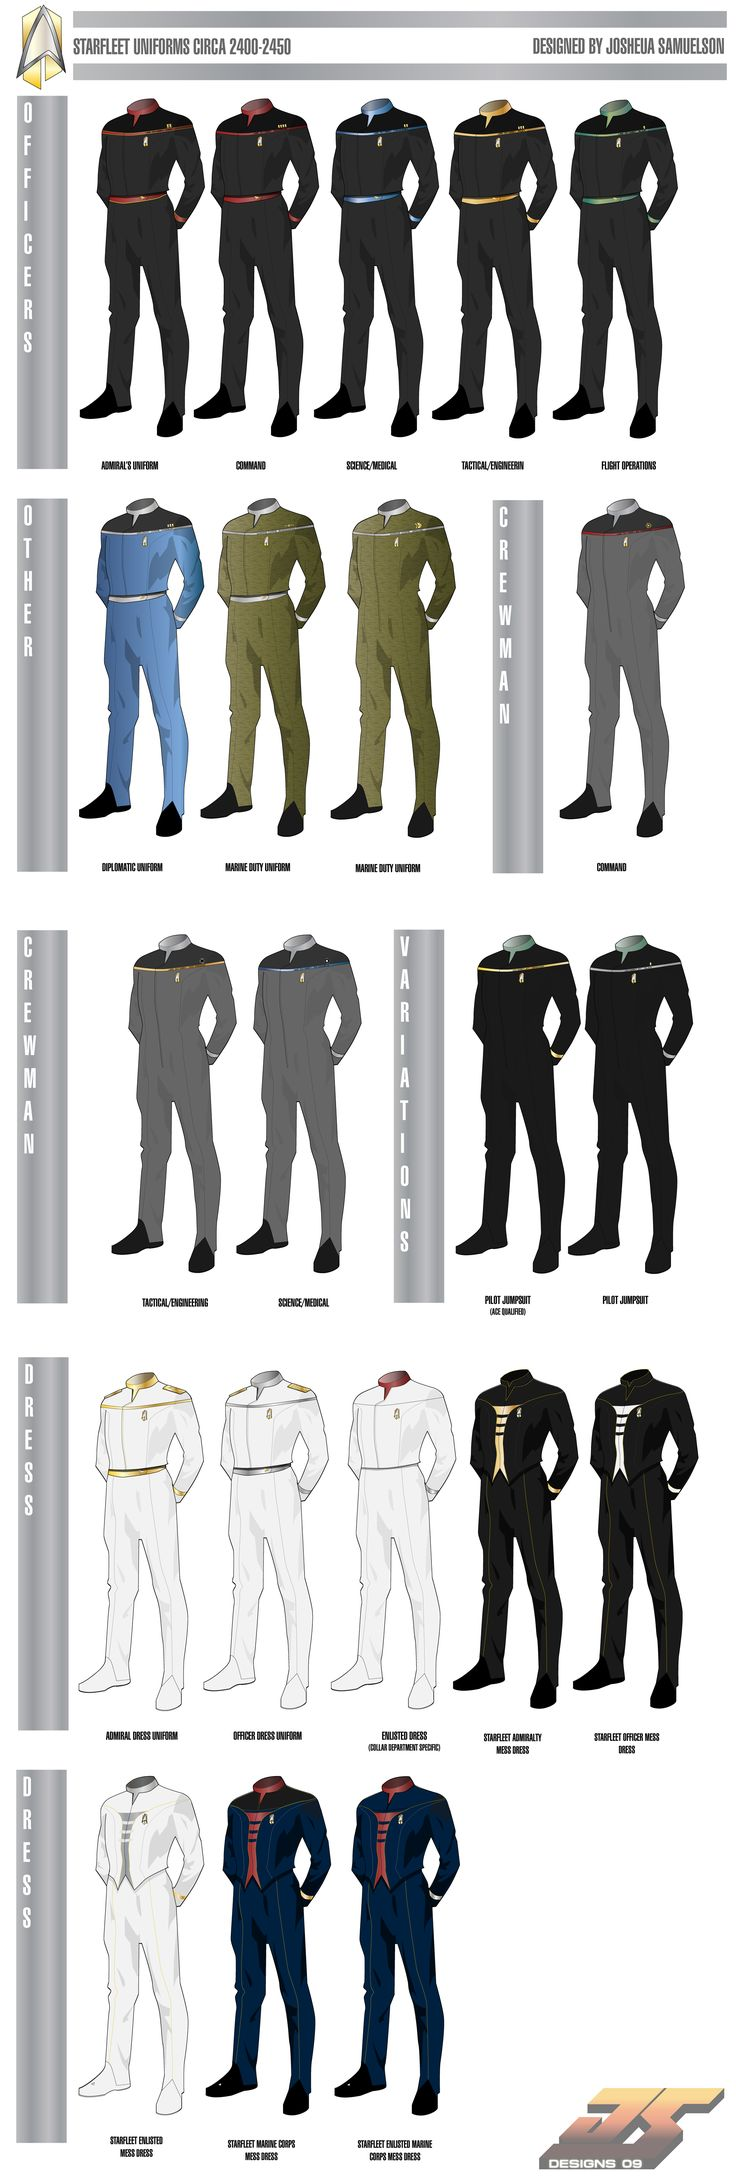 madeinjapan1988 star trek   Wolf's Shipyard :: View topic - Starfleet Uniforms Circa 2400 (UPDATED ...